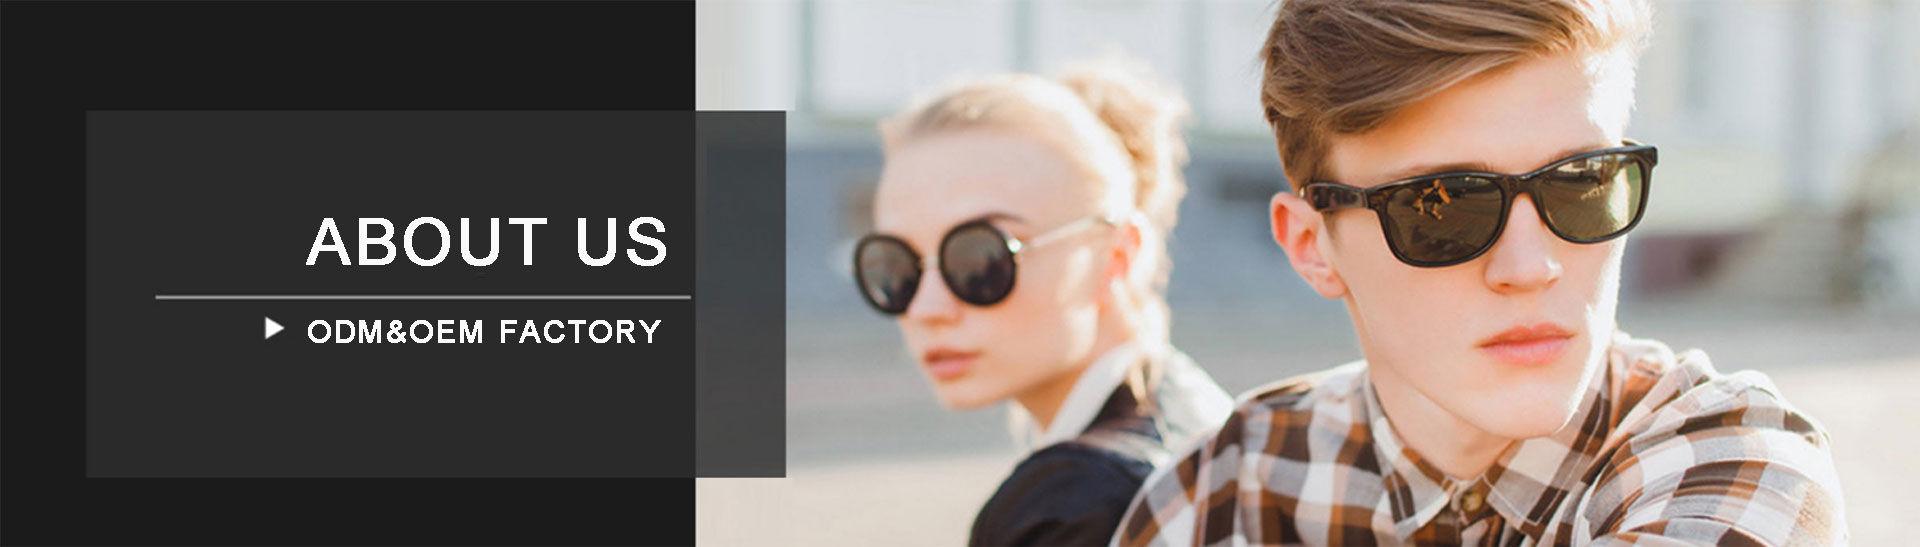 About a ShenZhen eyewear factory